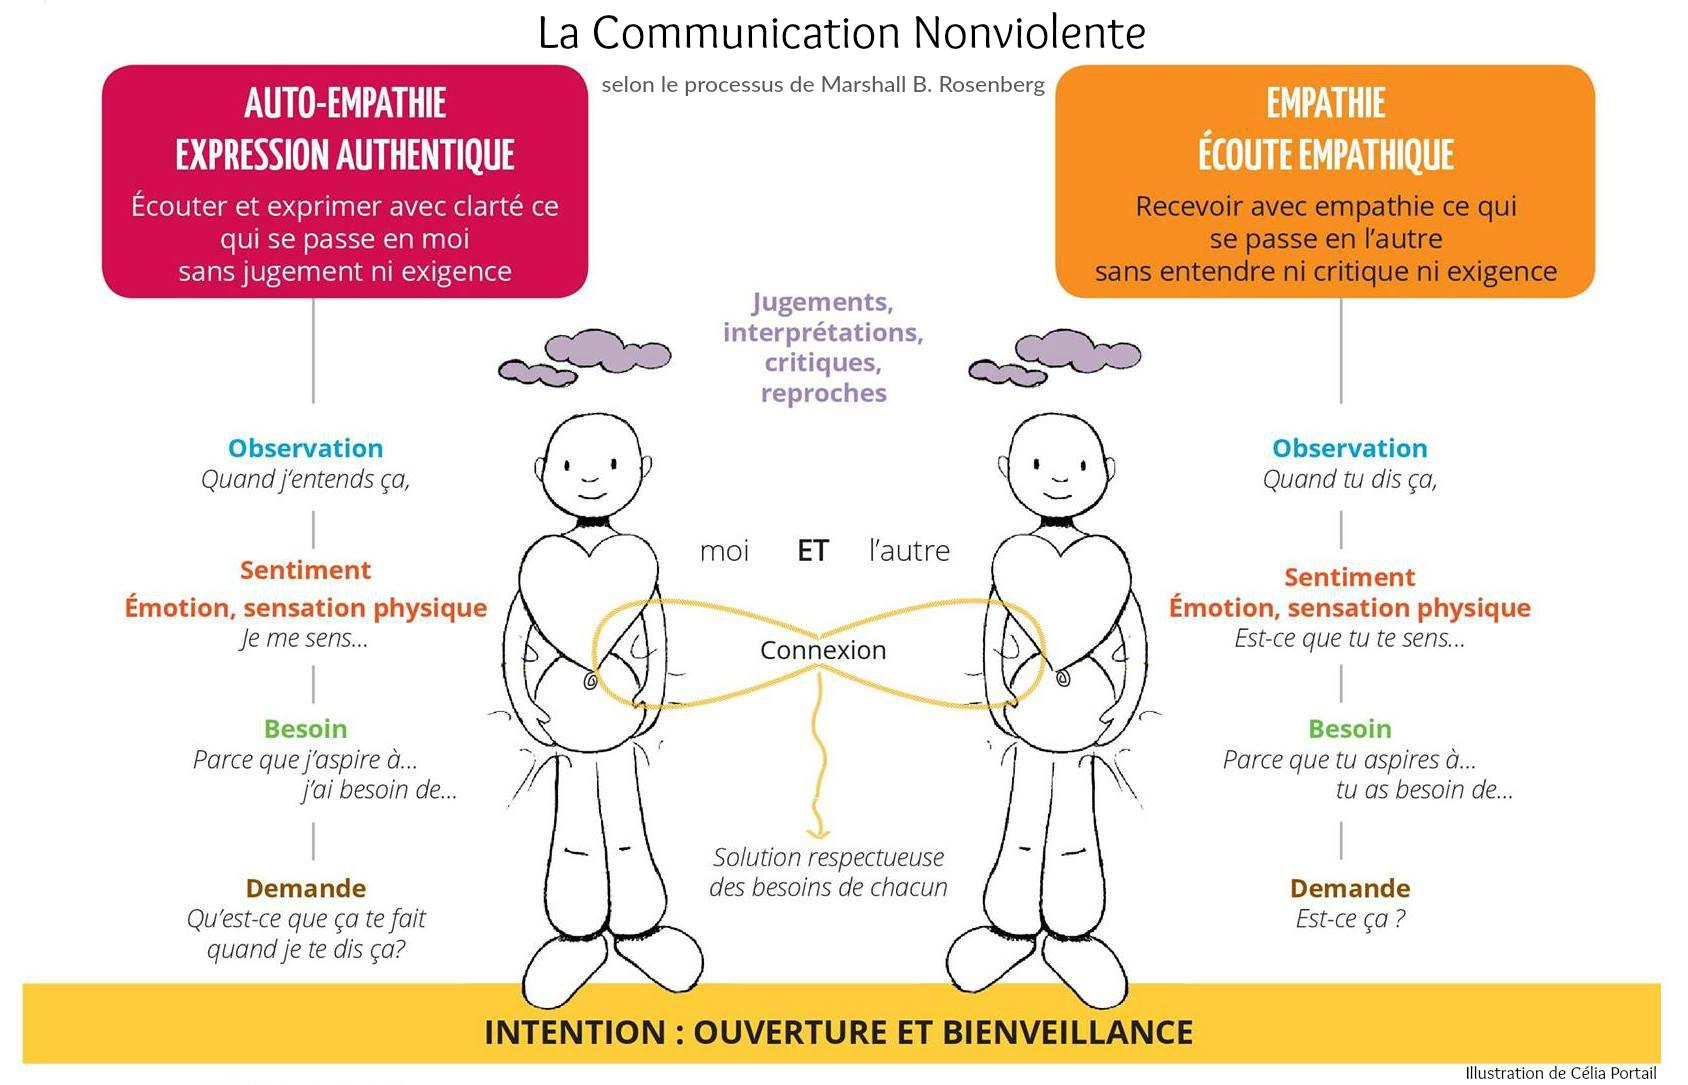 La communication non-violente